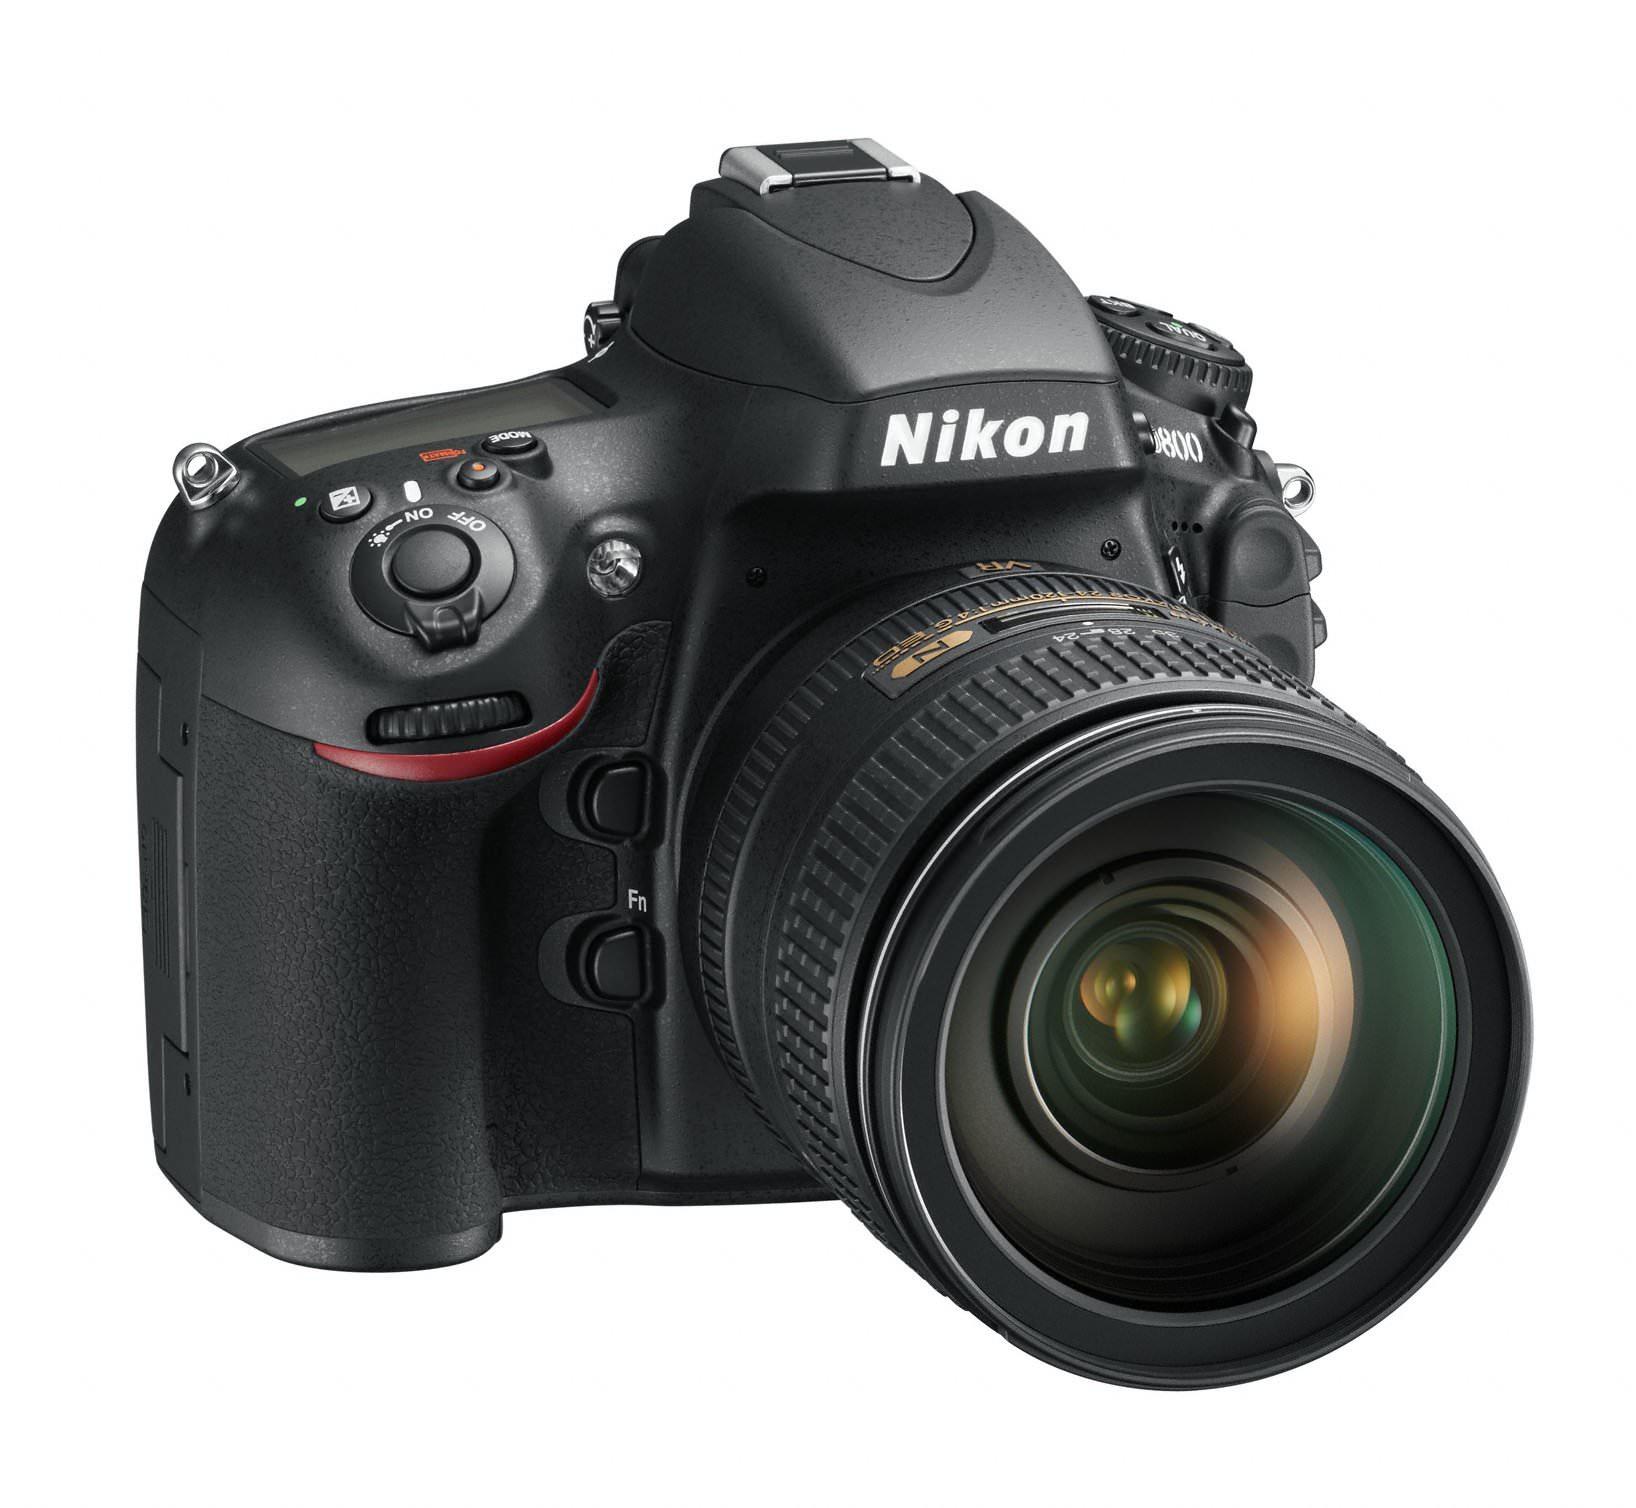 Nikon Professional Camera - about camera